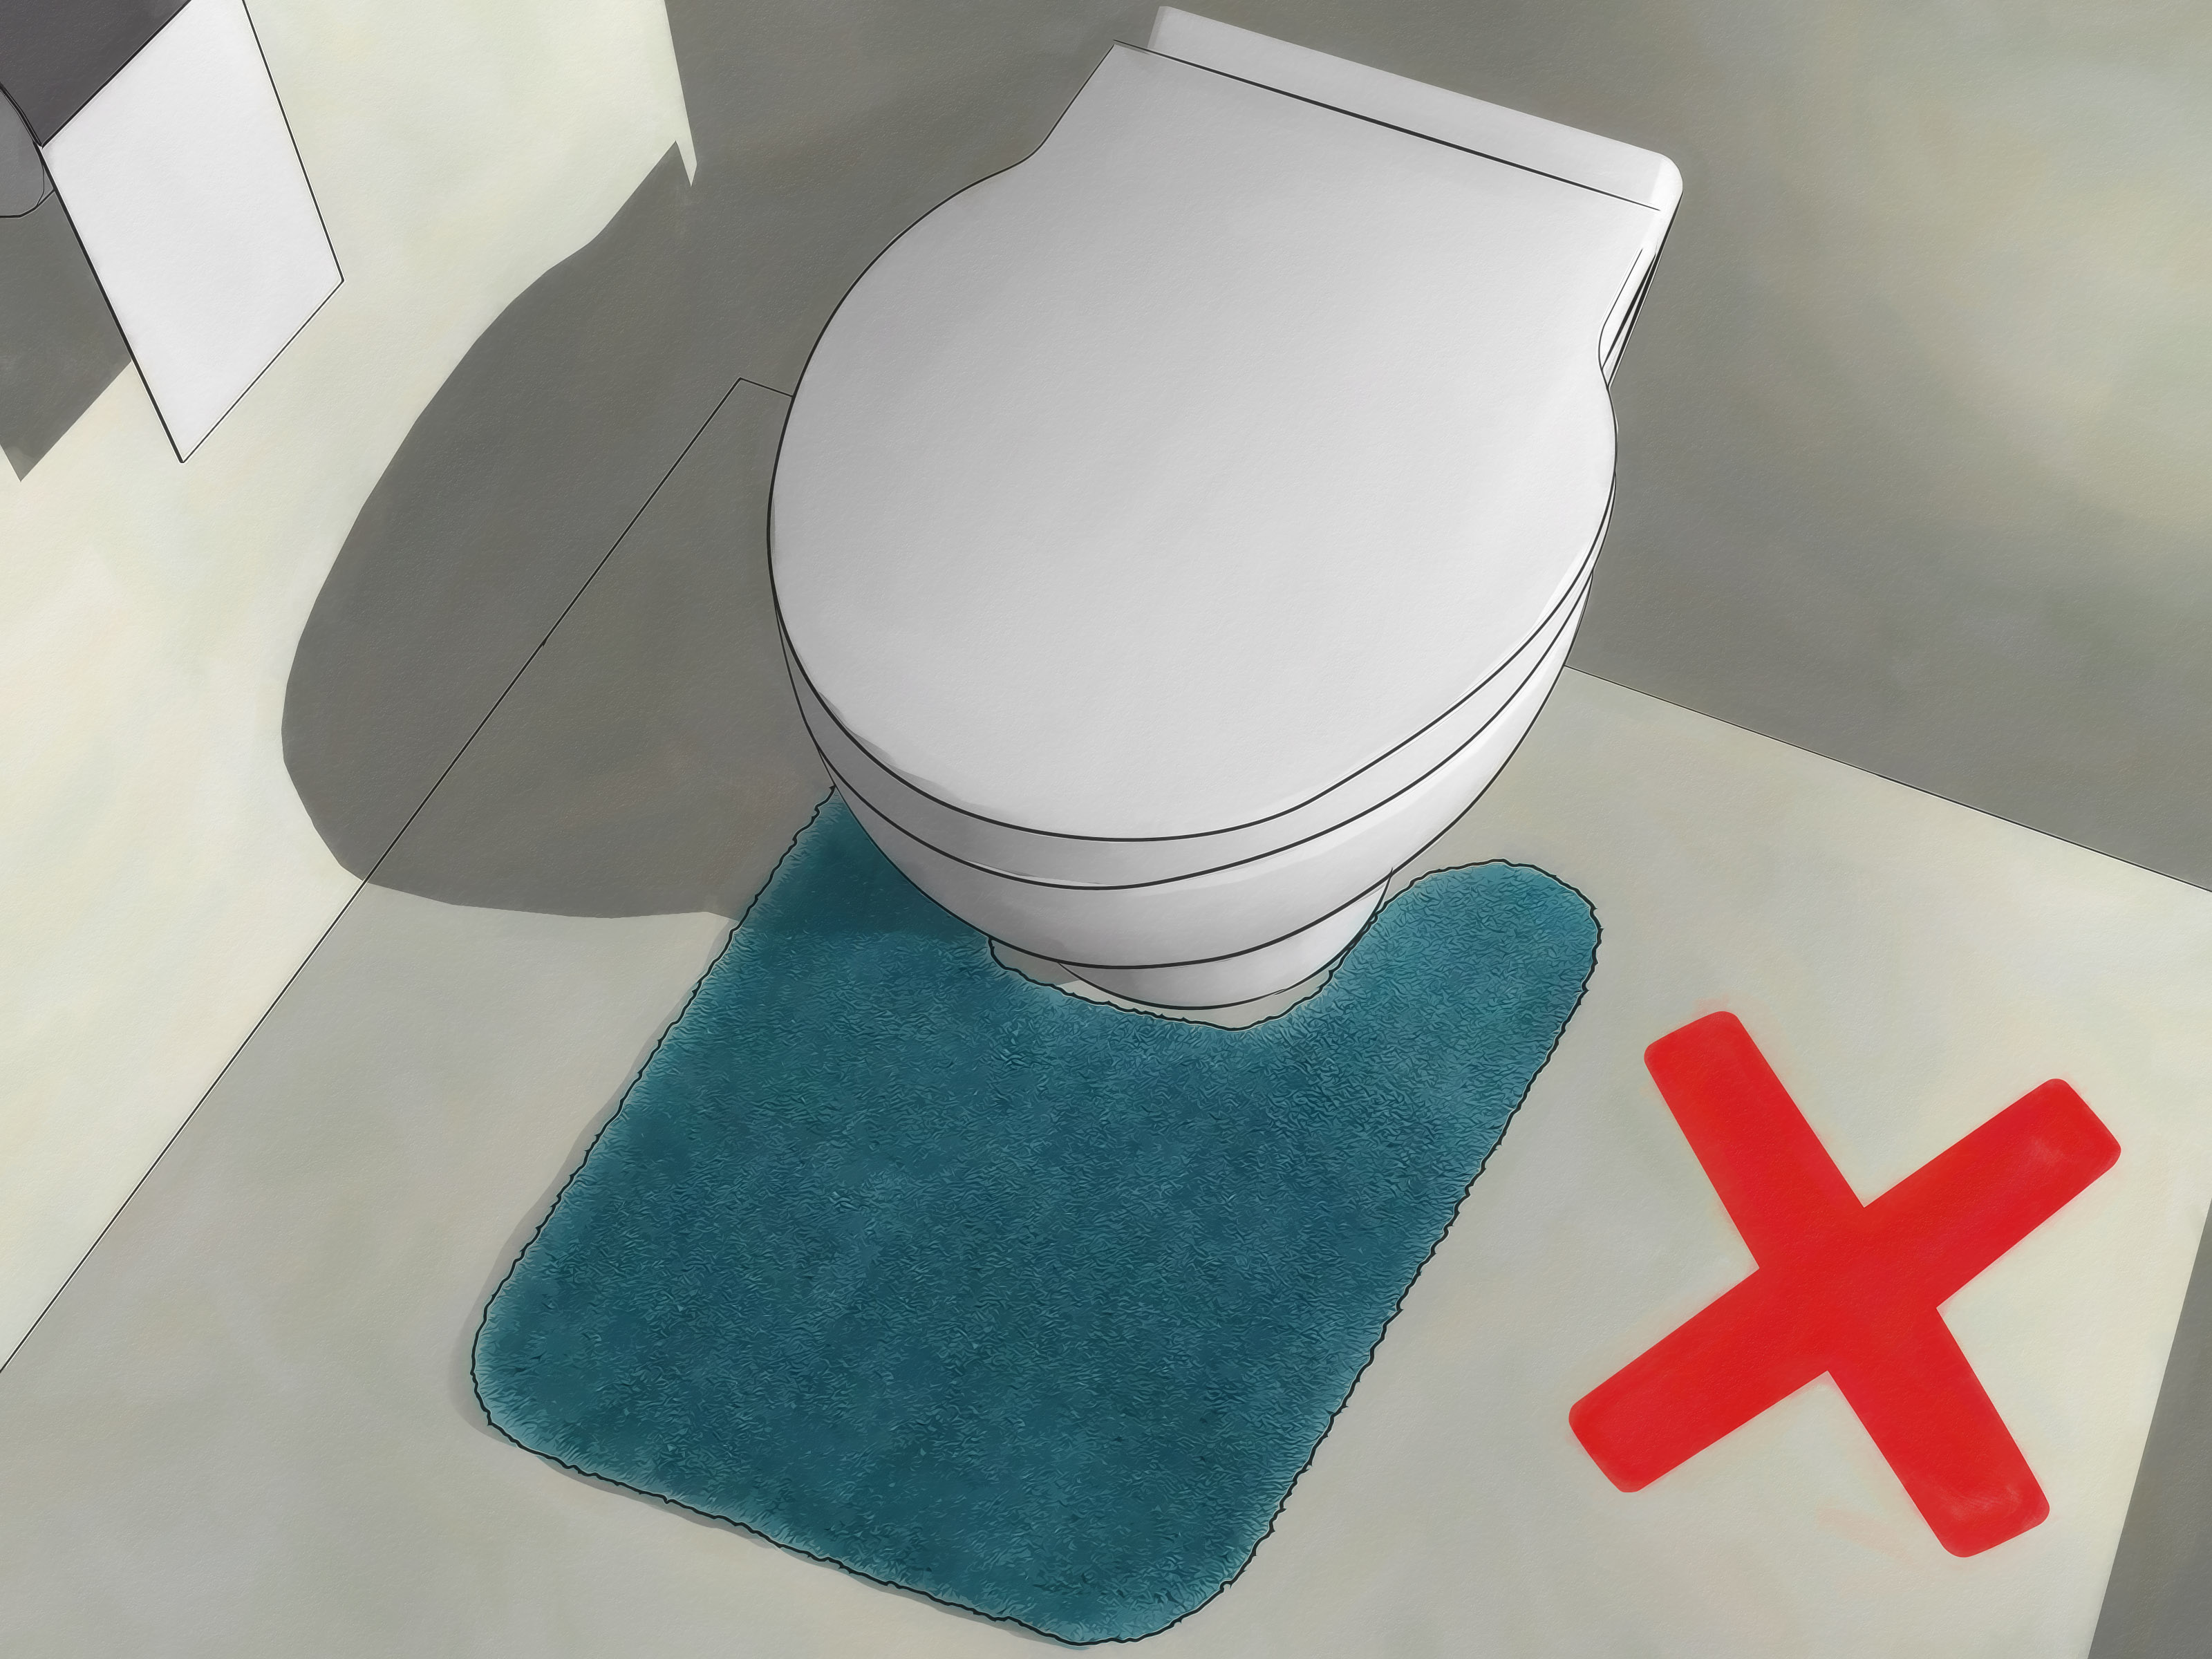 3 ways to choose bathroom towel colors - wikihow